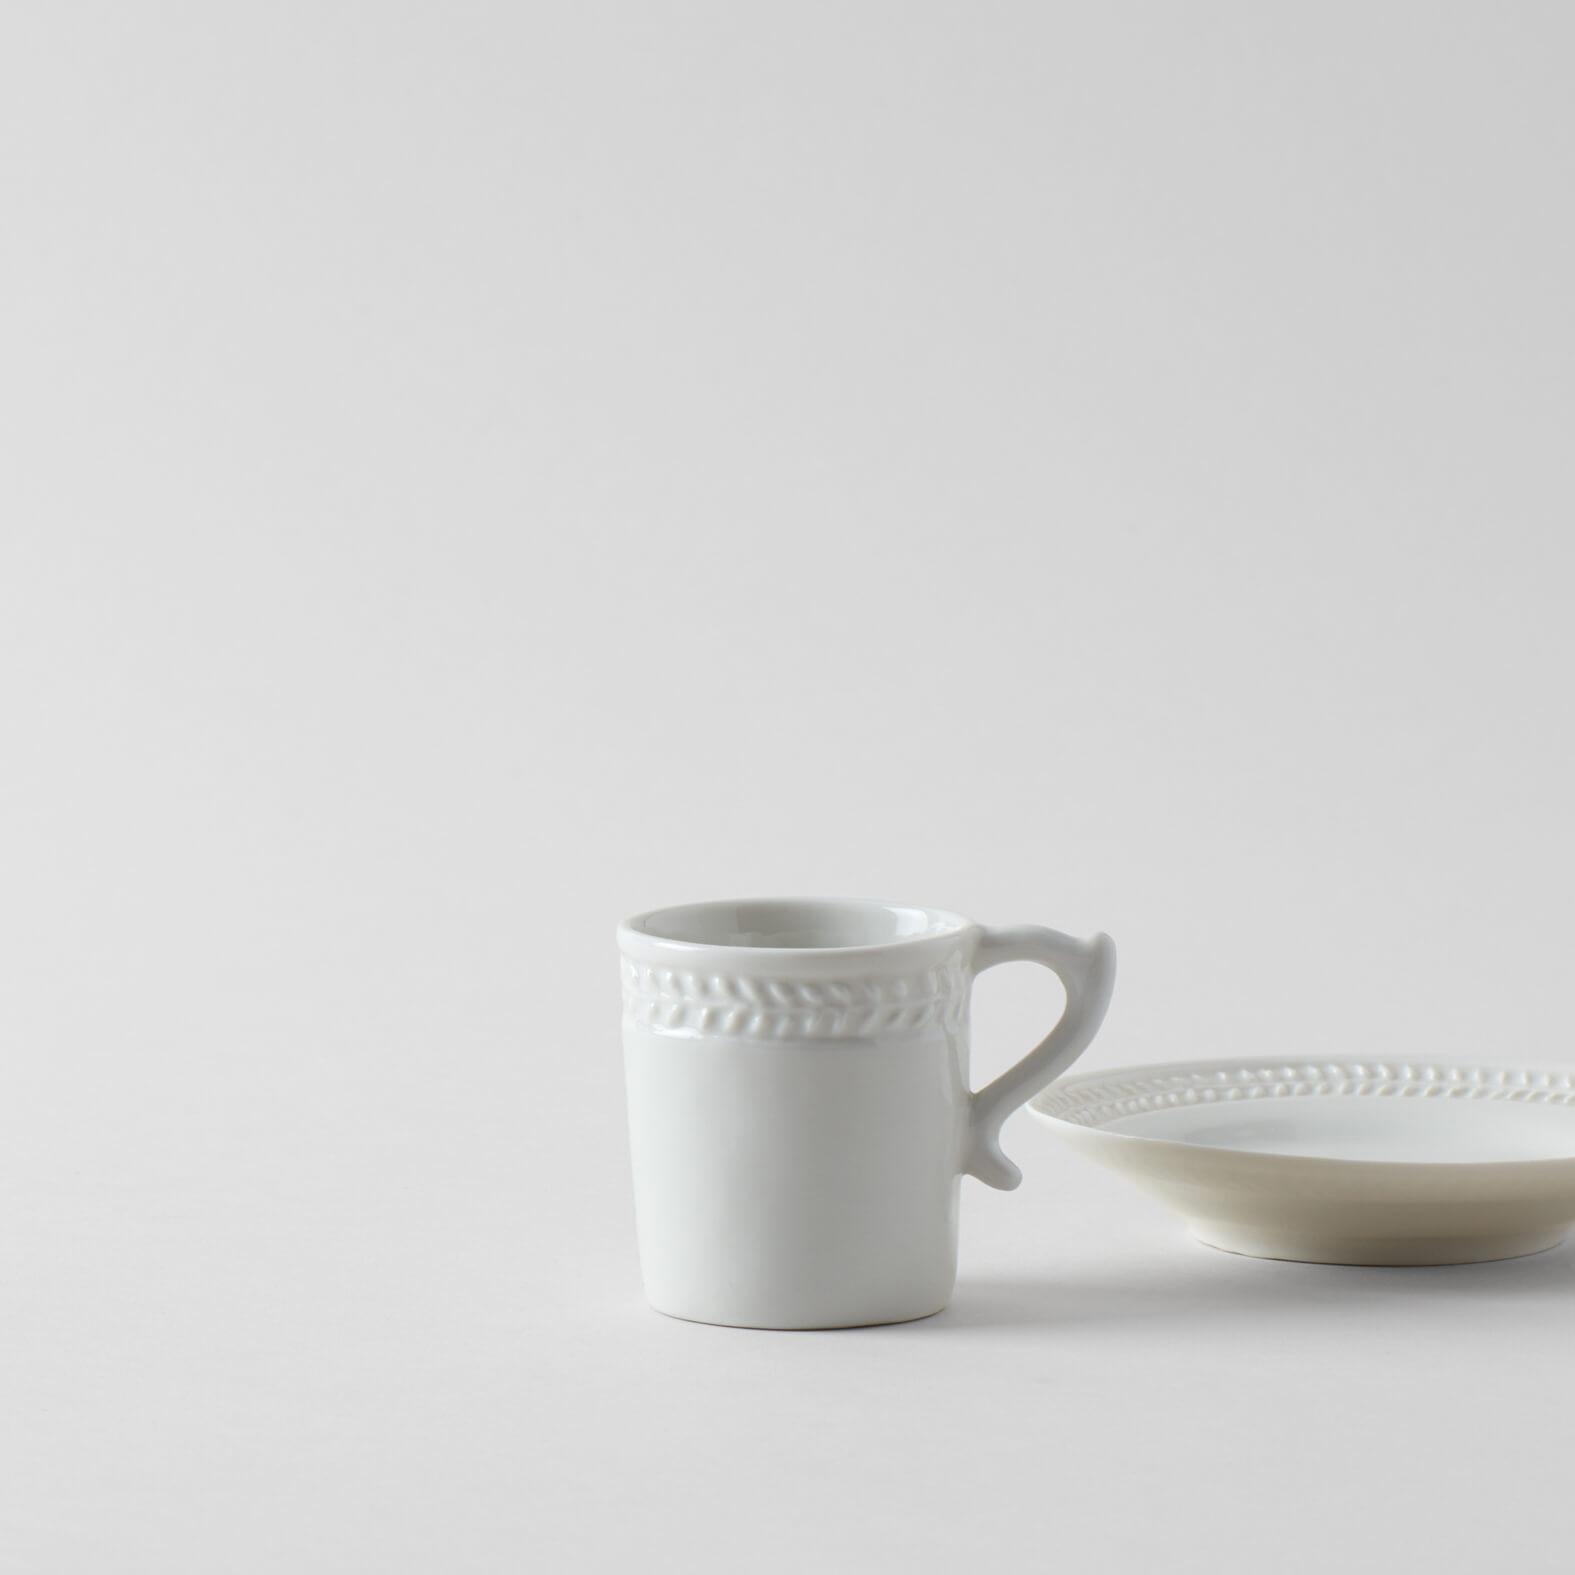 alix d reynis empire coffee mug saucer bodhi tree. Black Bedroom Furniture Sets. Home Design Ideas